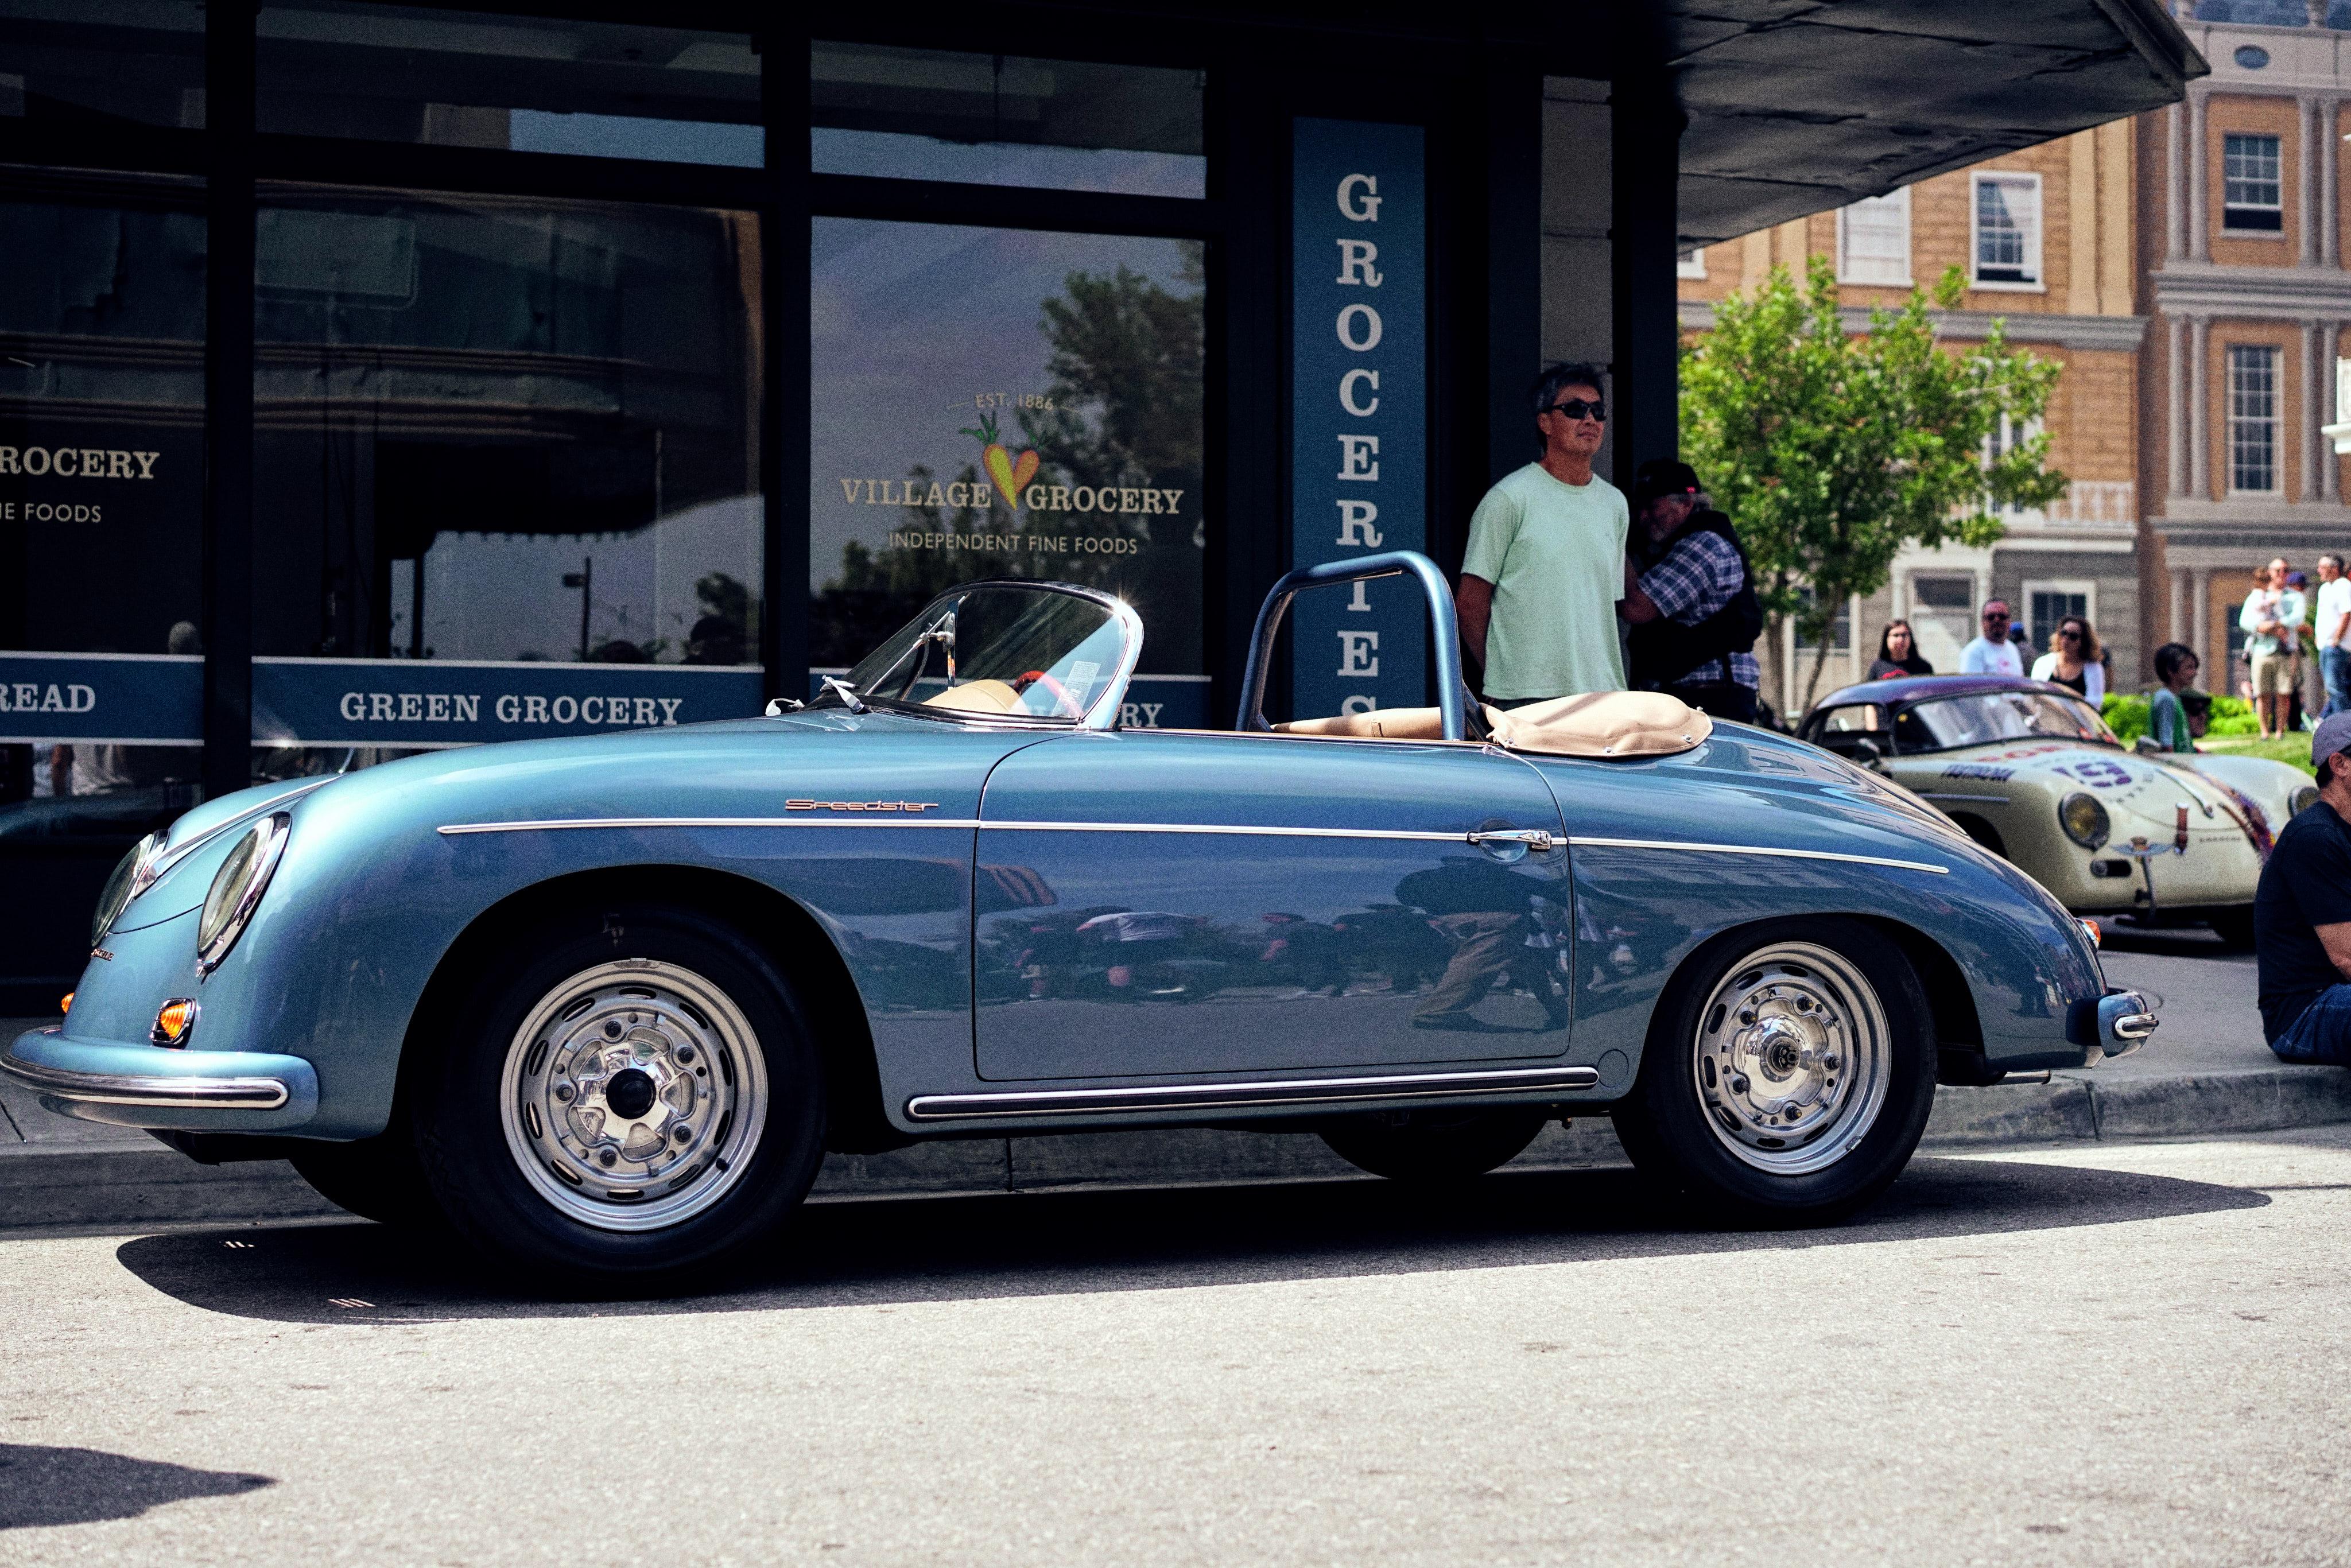 Luftgekühlt-6-Rennen-08-Porsche-356-1957-Speedster-Issabelle